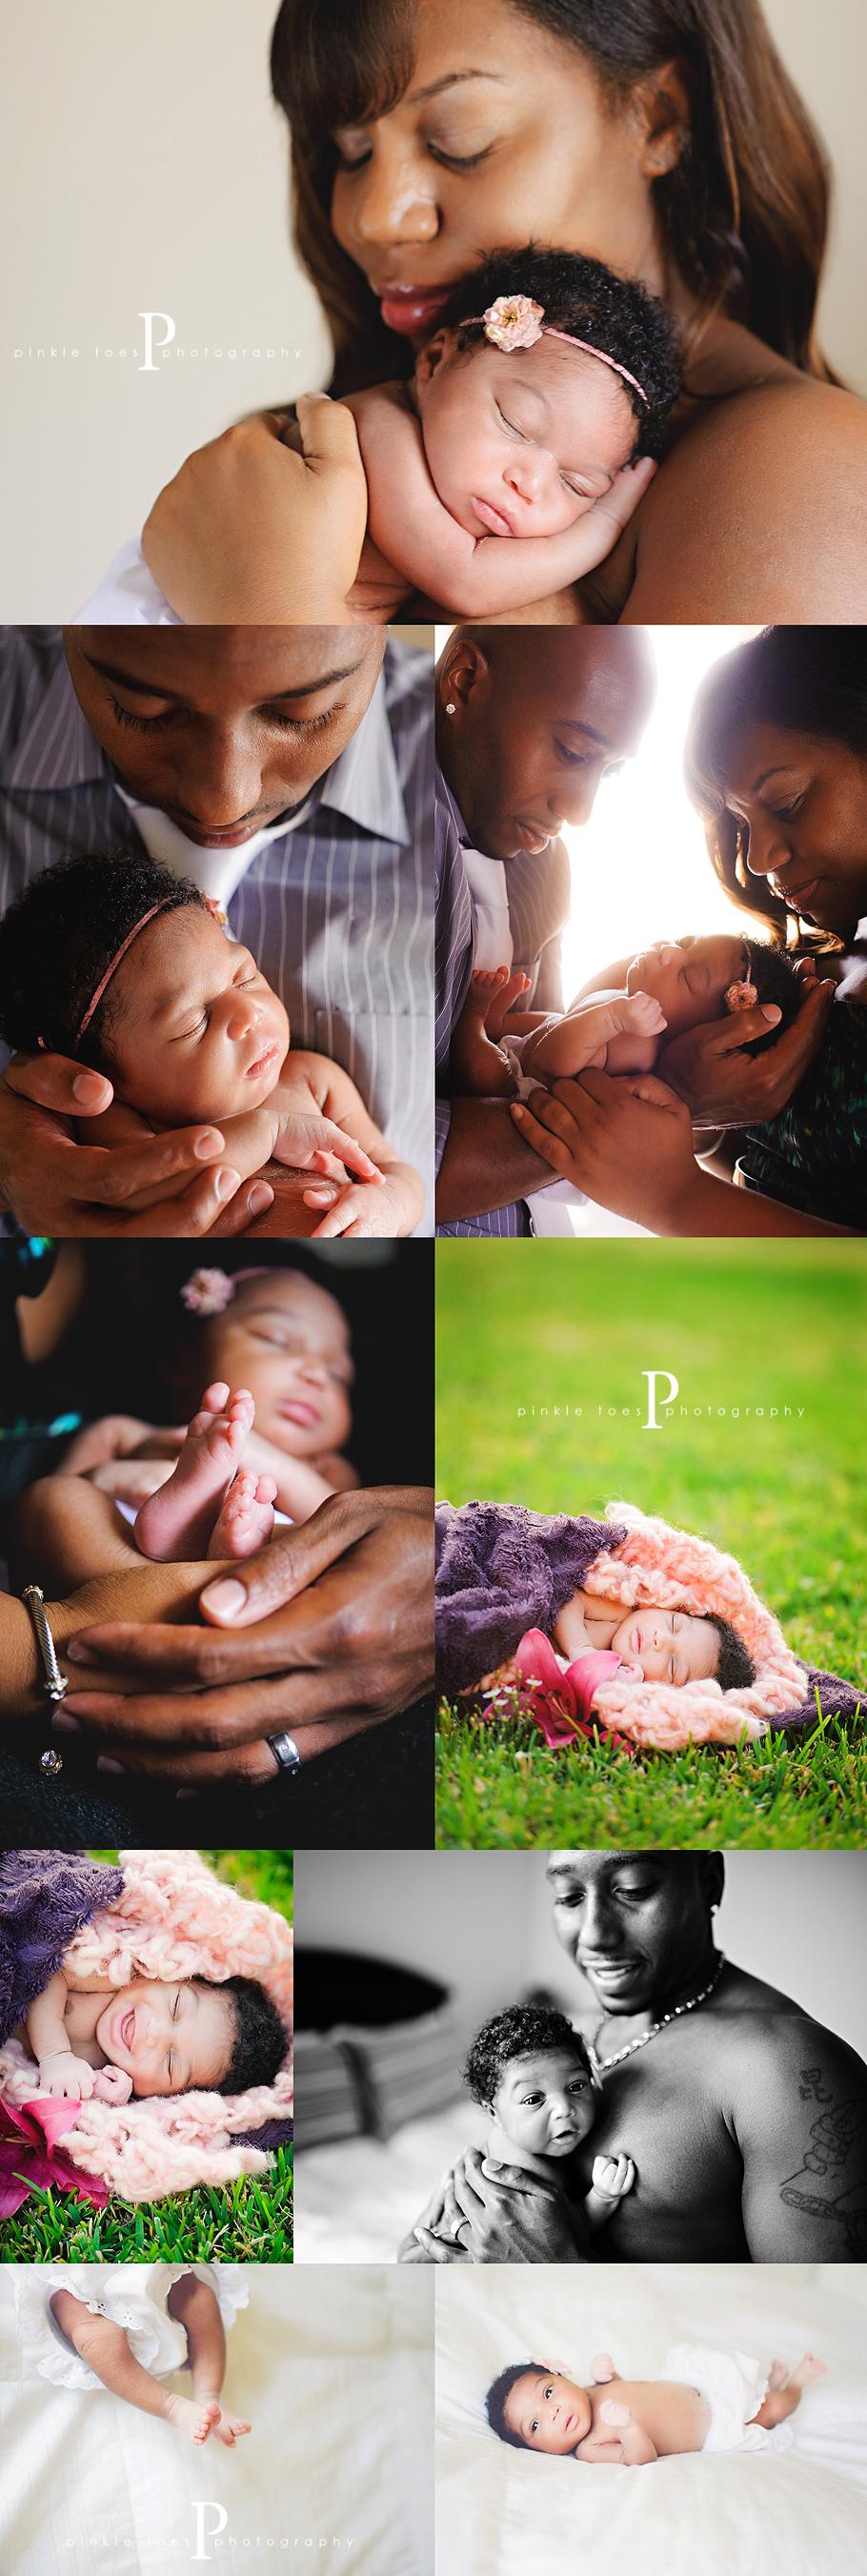 ln-austin-newborn-baby-lifestyle-photographer.jpg